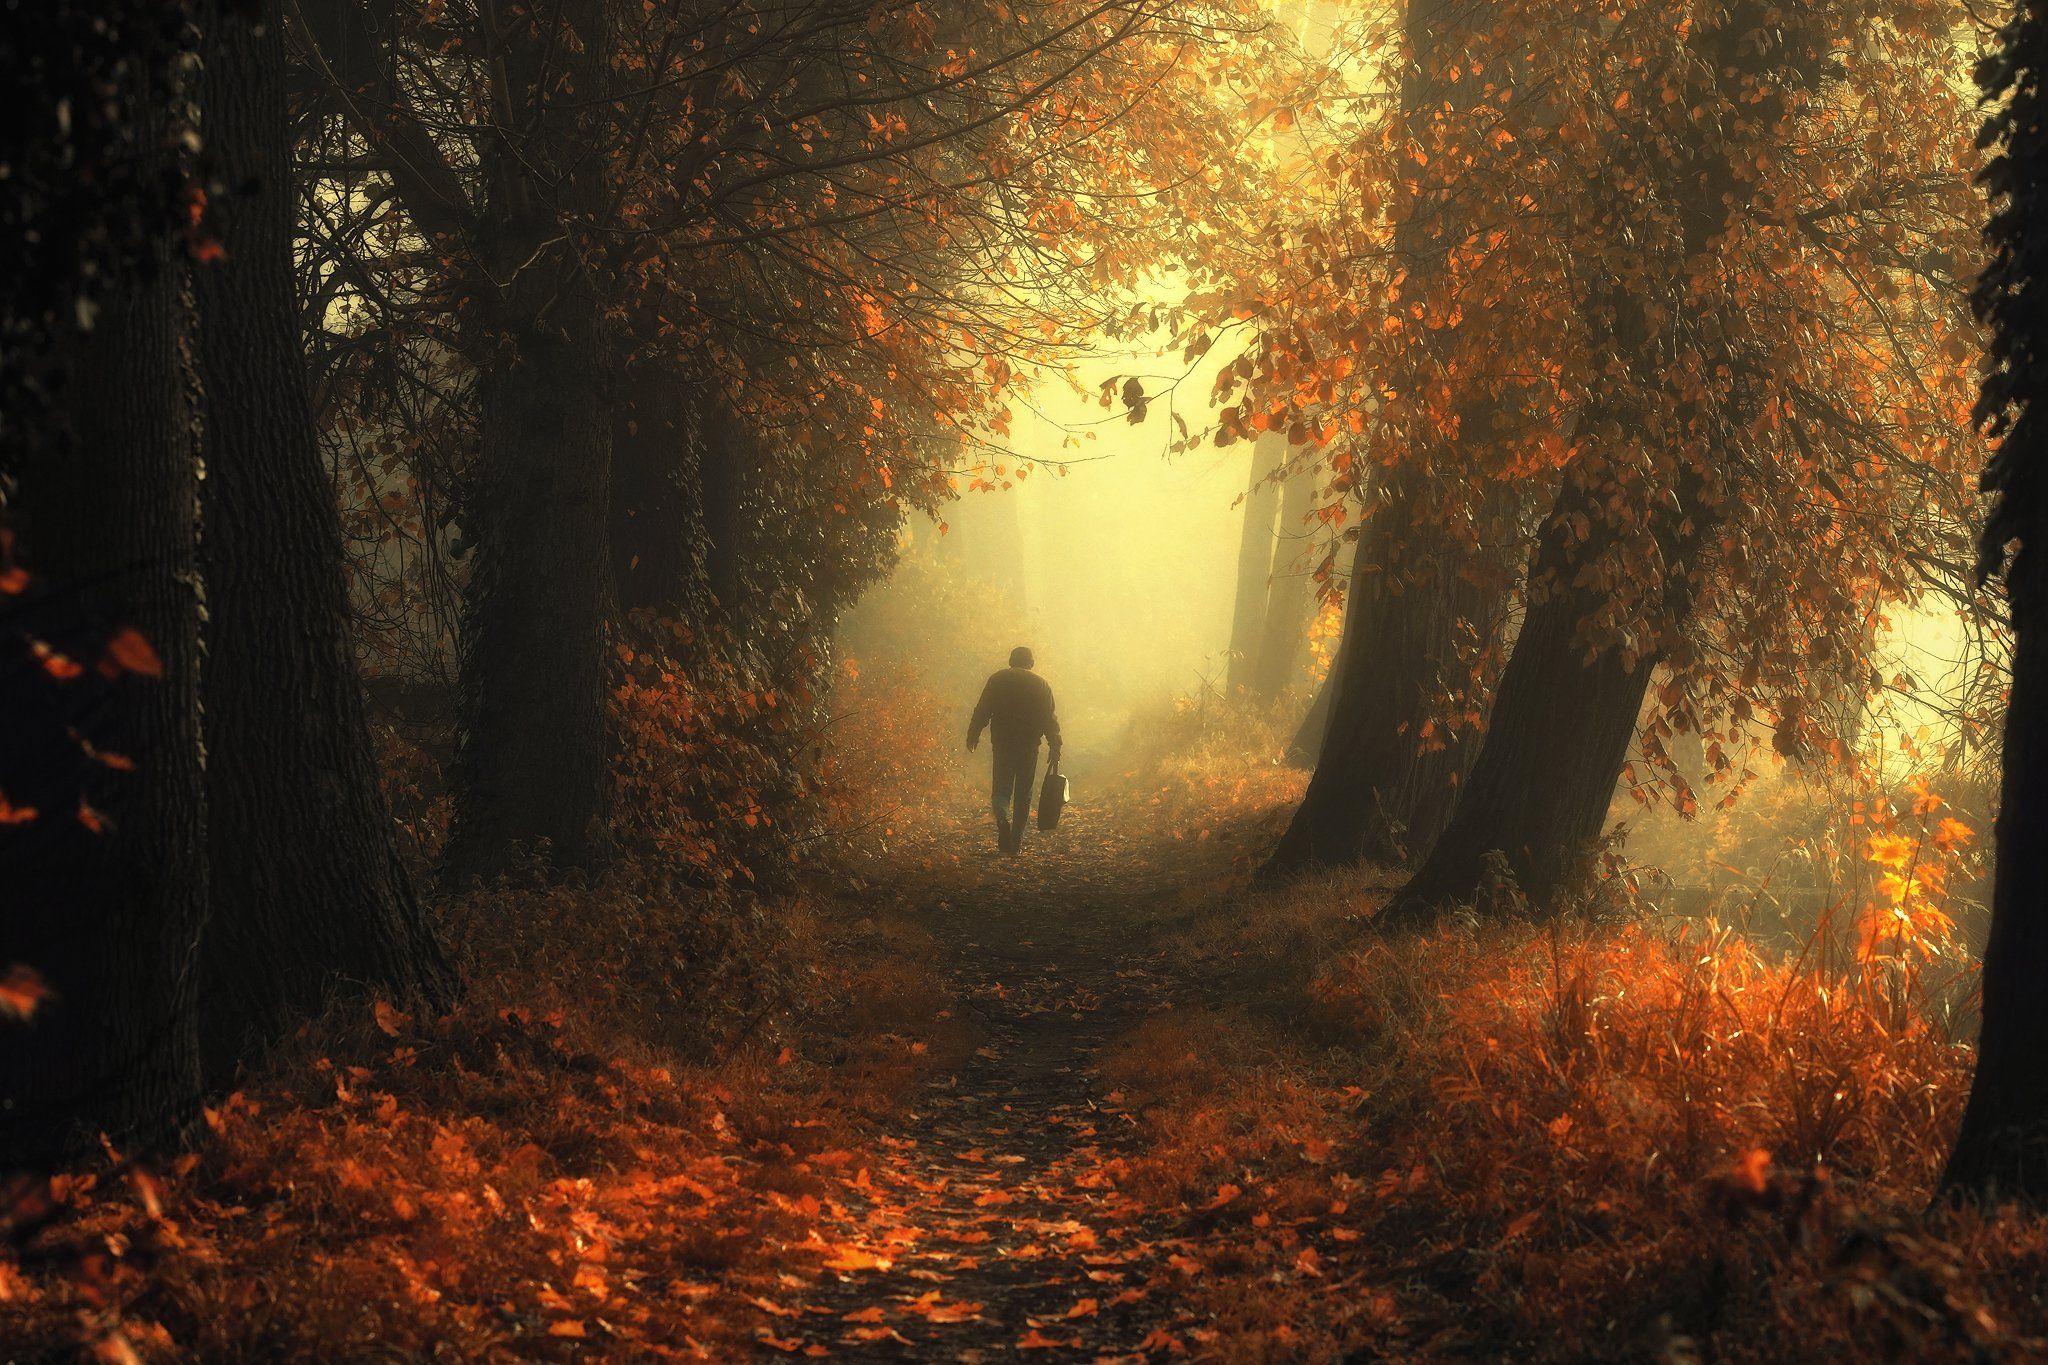 блестящая осень и странник autumn alley trees magic mist foggy path light, Radoslaw Dranikowski